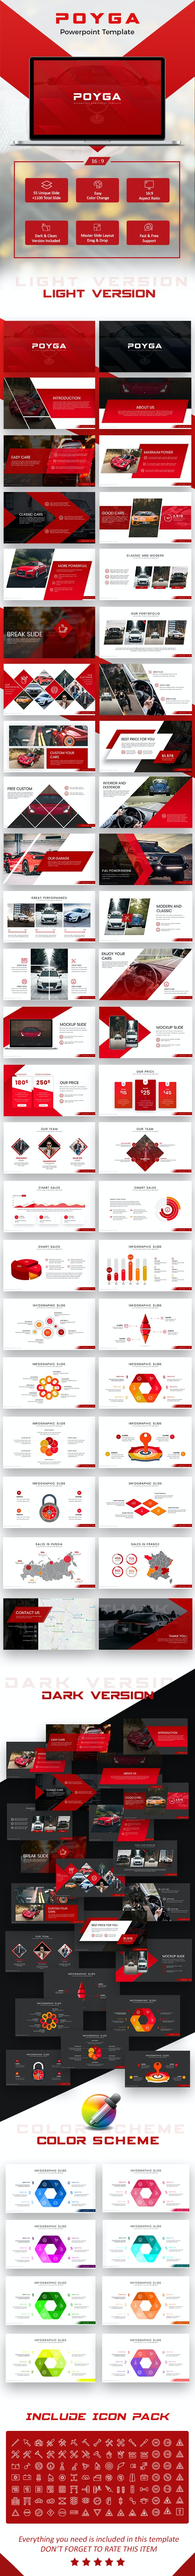 Poyga Automotive Presentation Template - PowerPoint Templates Presentation Templates